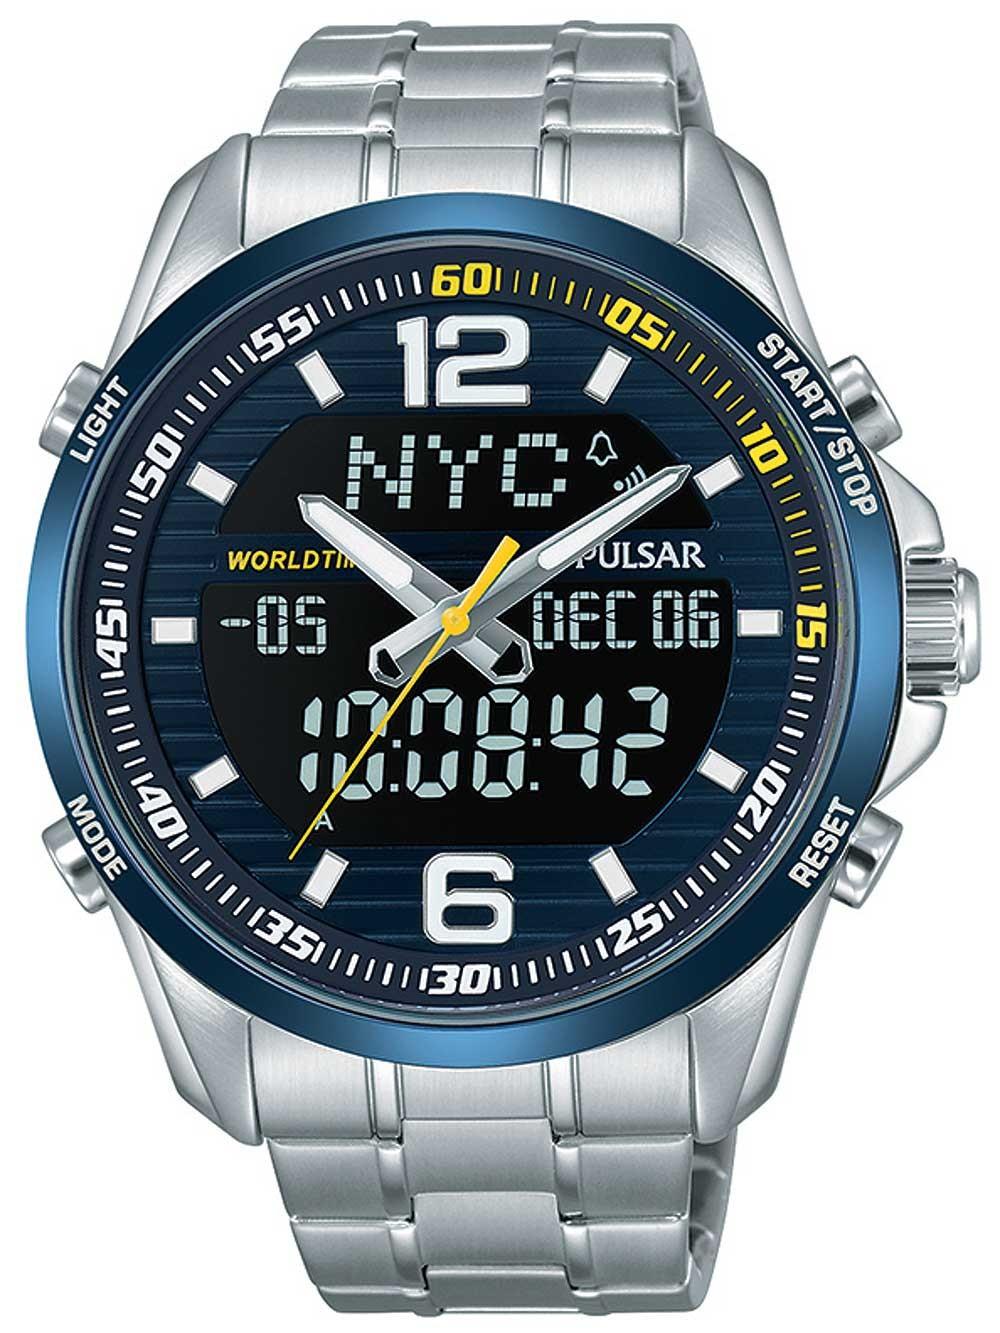 Ceas barbatesc Pulsar PZ4003X1 Chronograph 44 10ATM